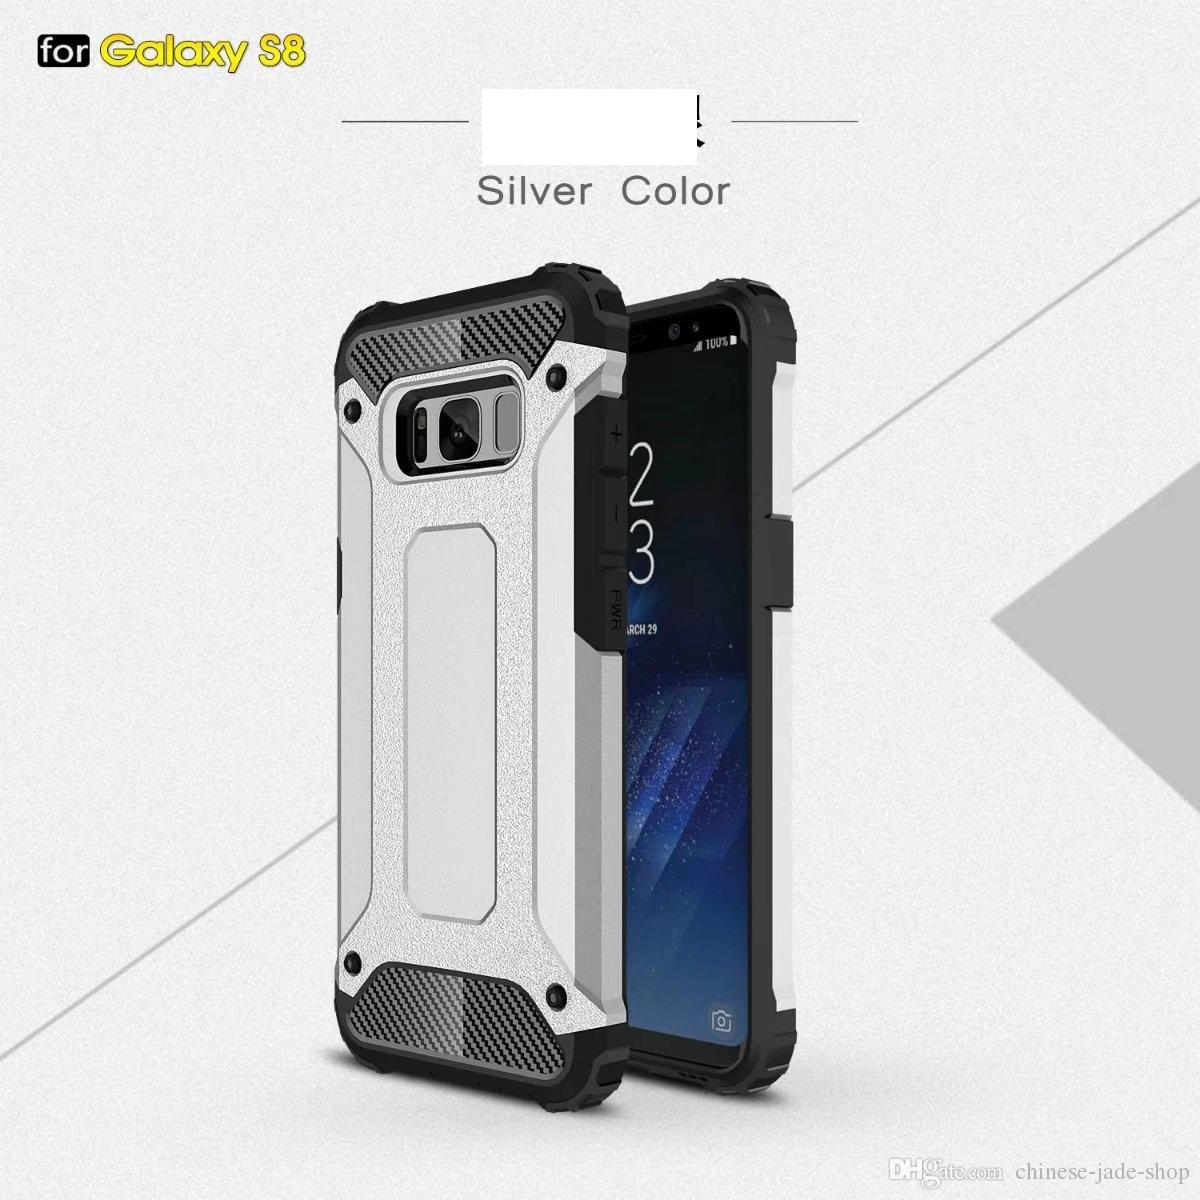 Armor Hybrid Defender Case TPU + PC Funda a prueba de golpes para IPhone X XR XS XS MAX 5 se 6 7 8 plus Galaxy S5 S6 S7 S6 EDGE s8 S8 PLUS 50 piezas